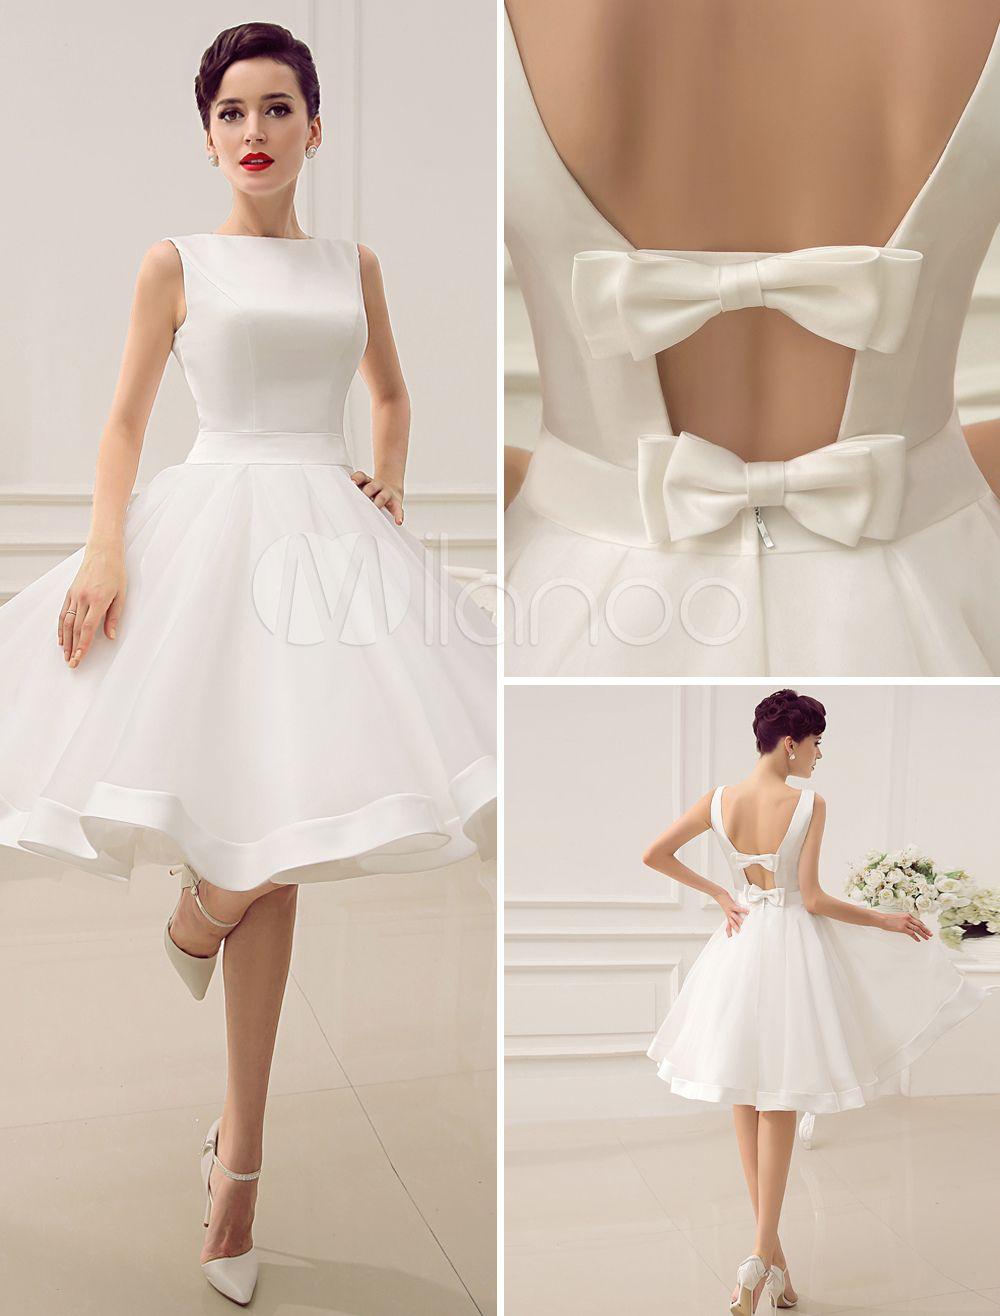 Courthouse wedding dresses under $100   Wedding Dress for A Short Bride  Wedding Dresses for Guests